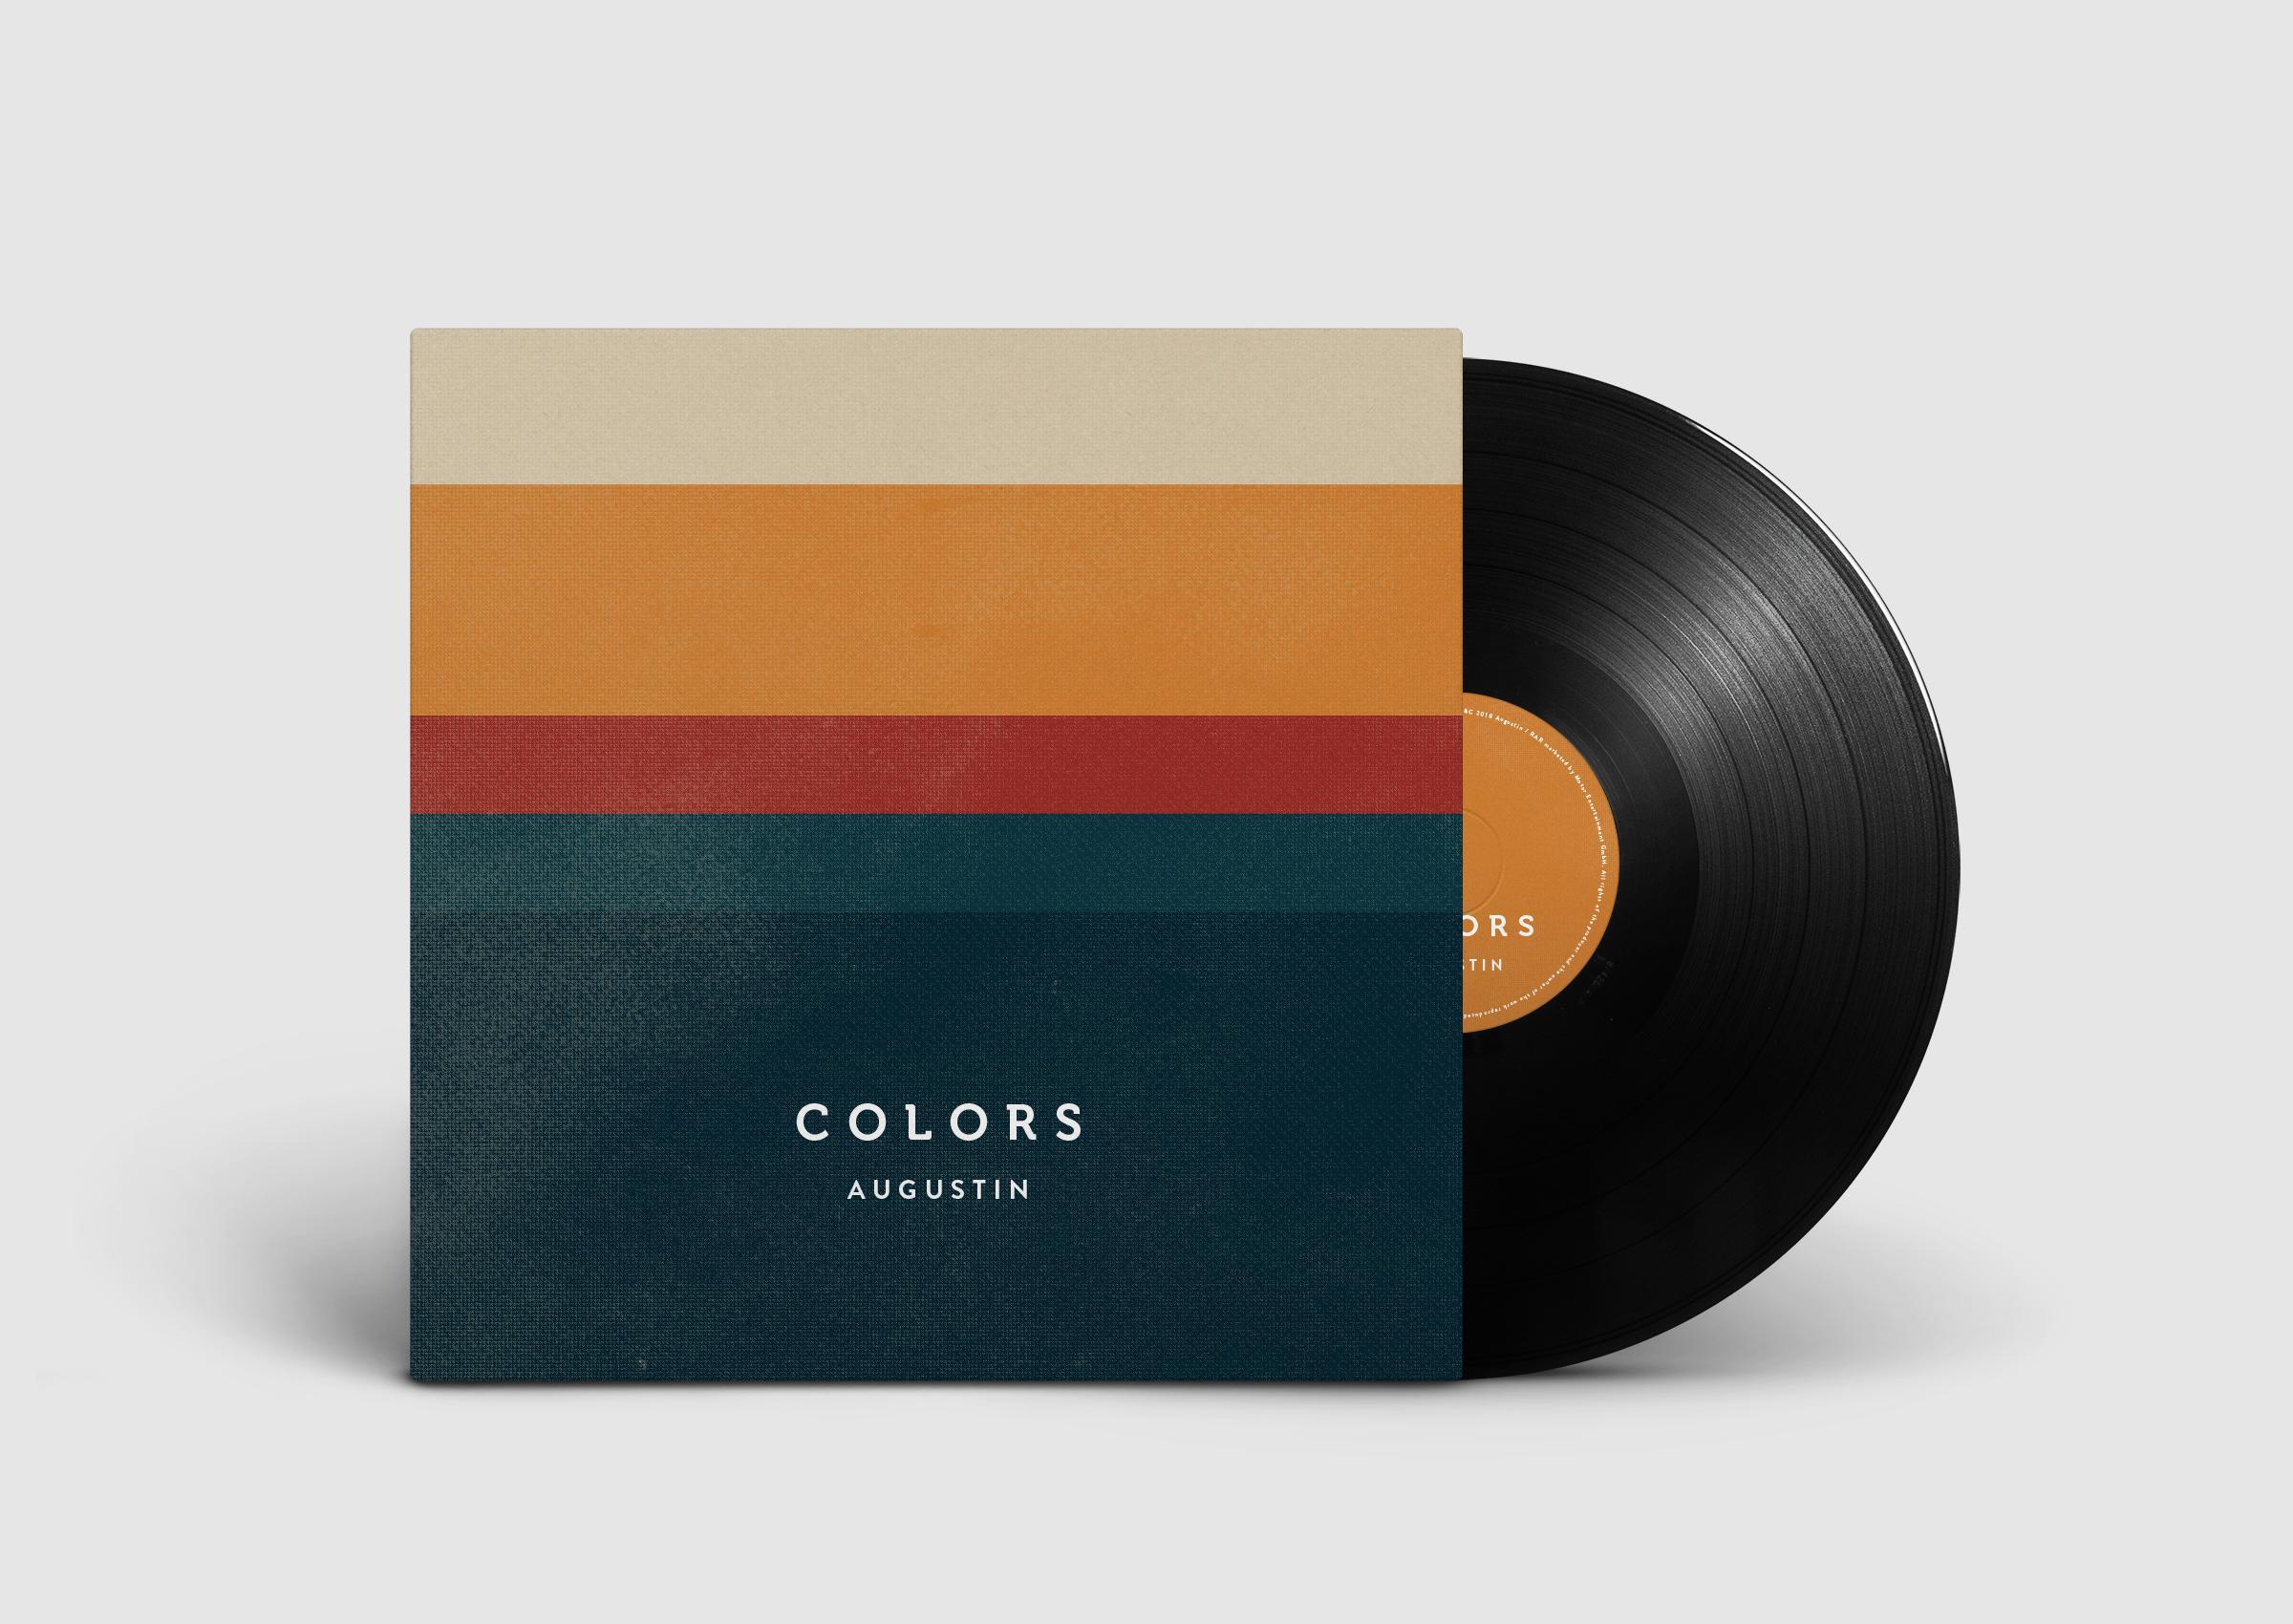 Vinyl Cover und Lable